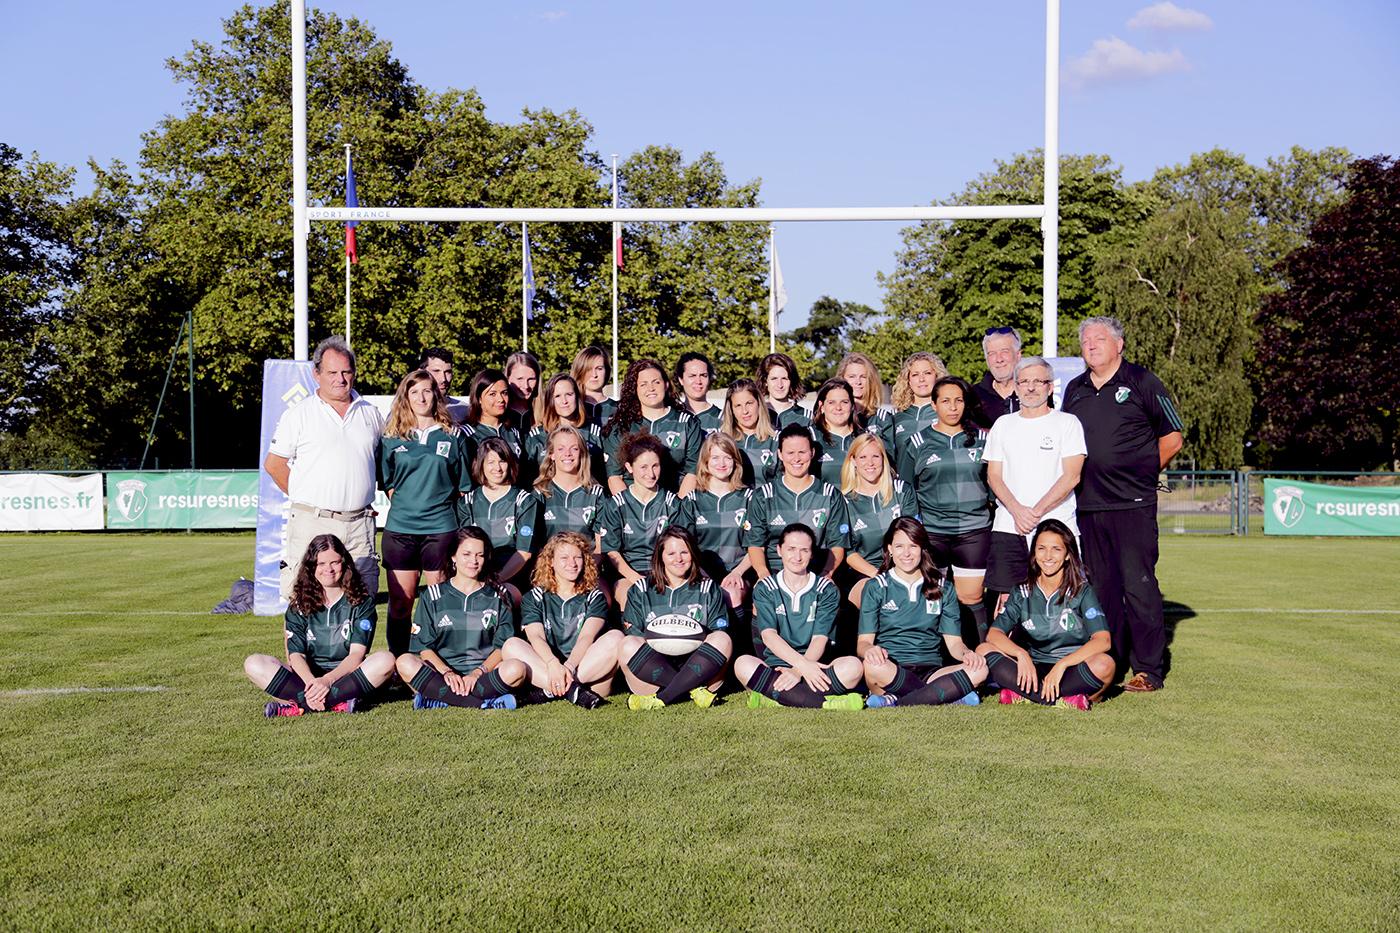 L'équipe Sénior Féminine du Rugby Club Suresnois